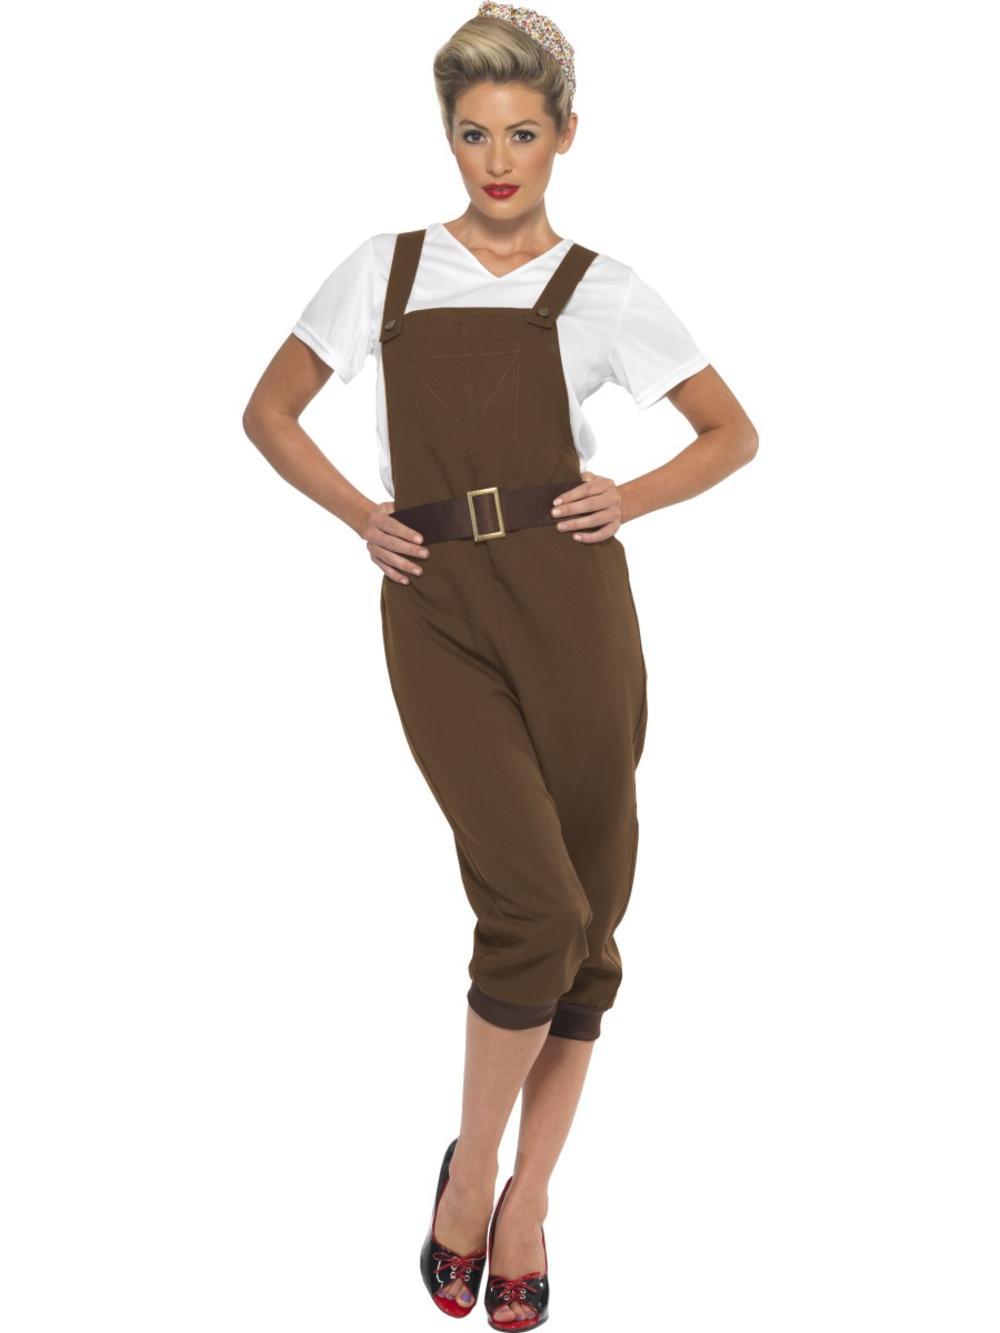 Land Girl Ladies Fancy Dress 1940s 1930s British History Womens Adults Costume